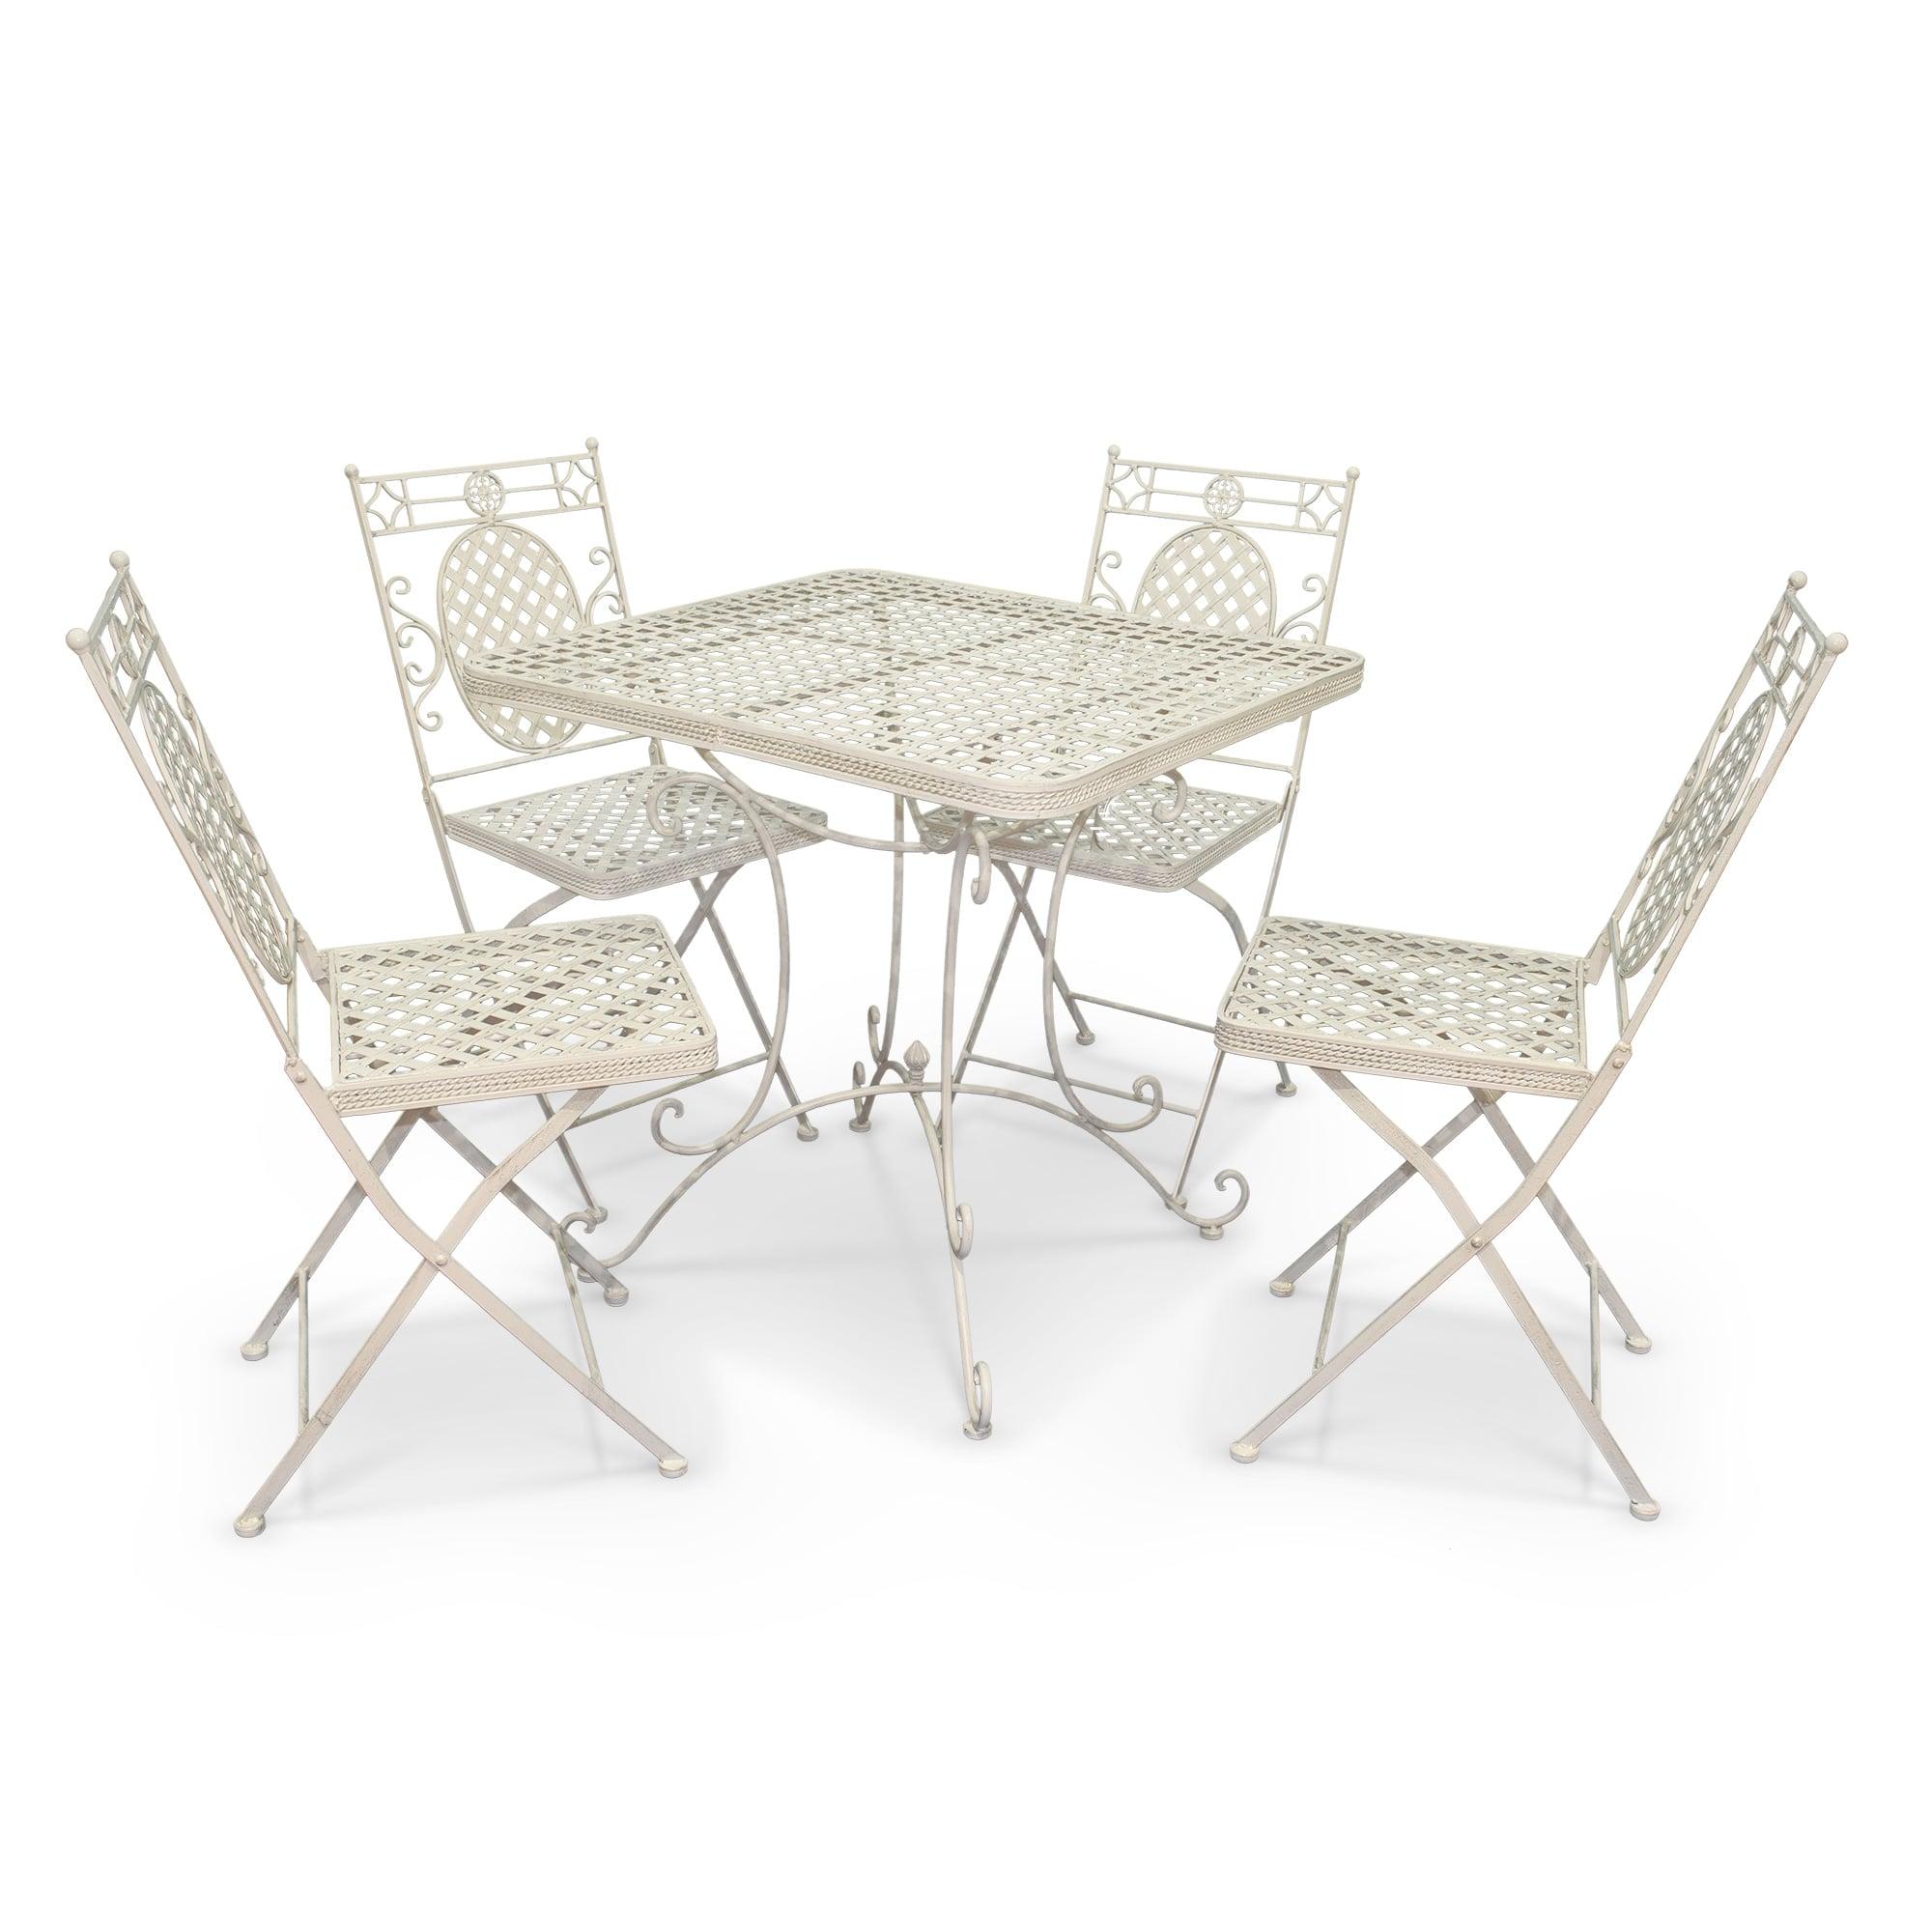 leader area space ideas focus steelcase resources h furniture planning studio